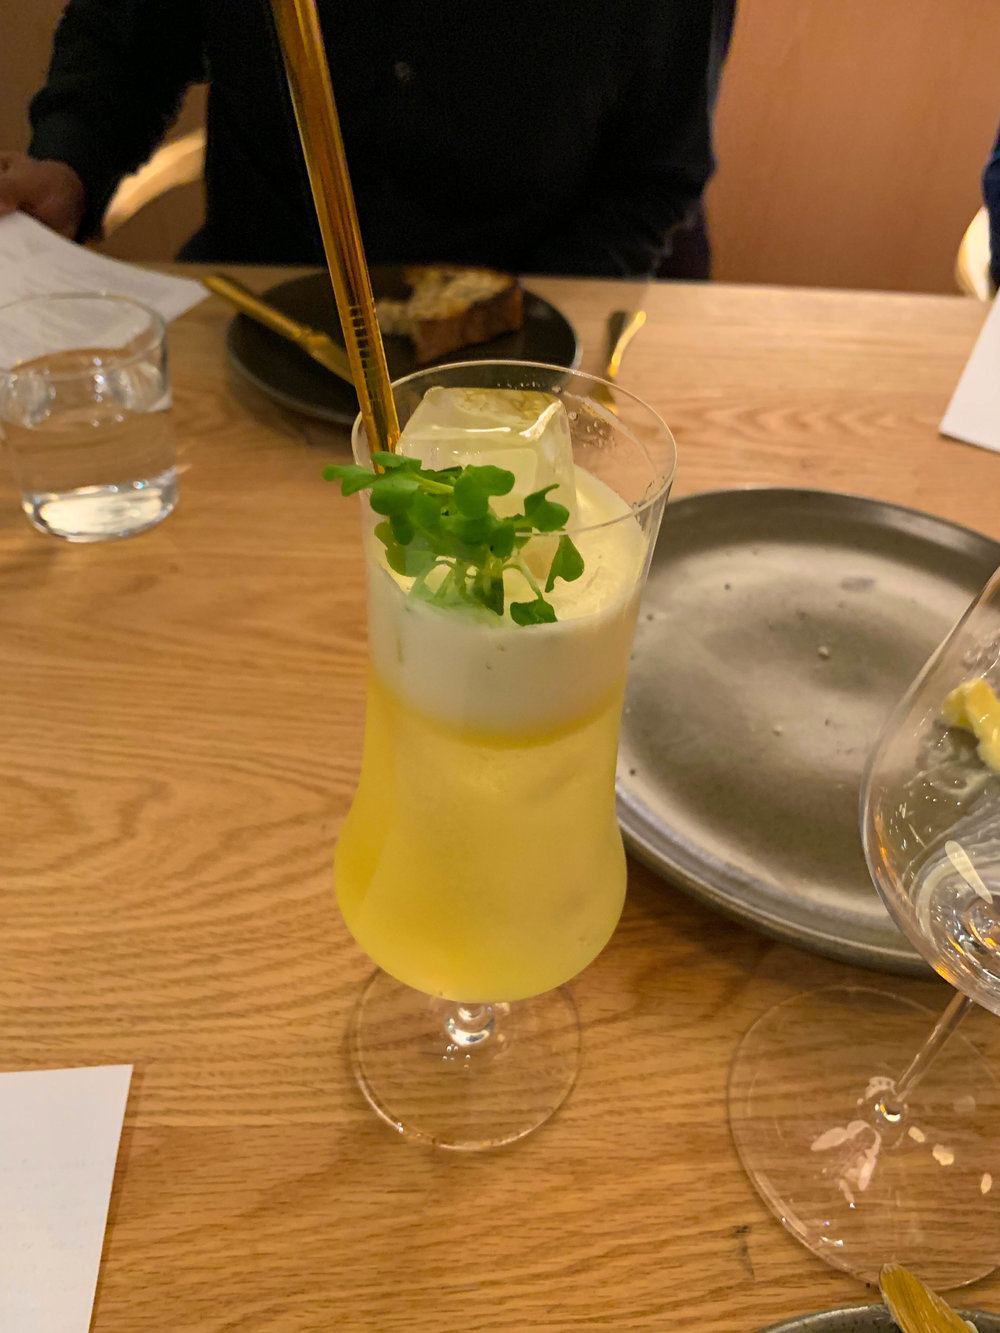 Celine Dijon - Pineapple Mostarda, tequila reposado, lilet blanc, seltzer